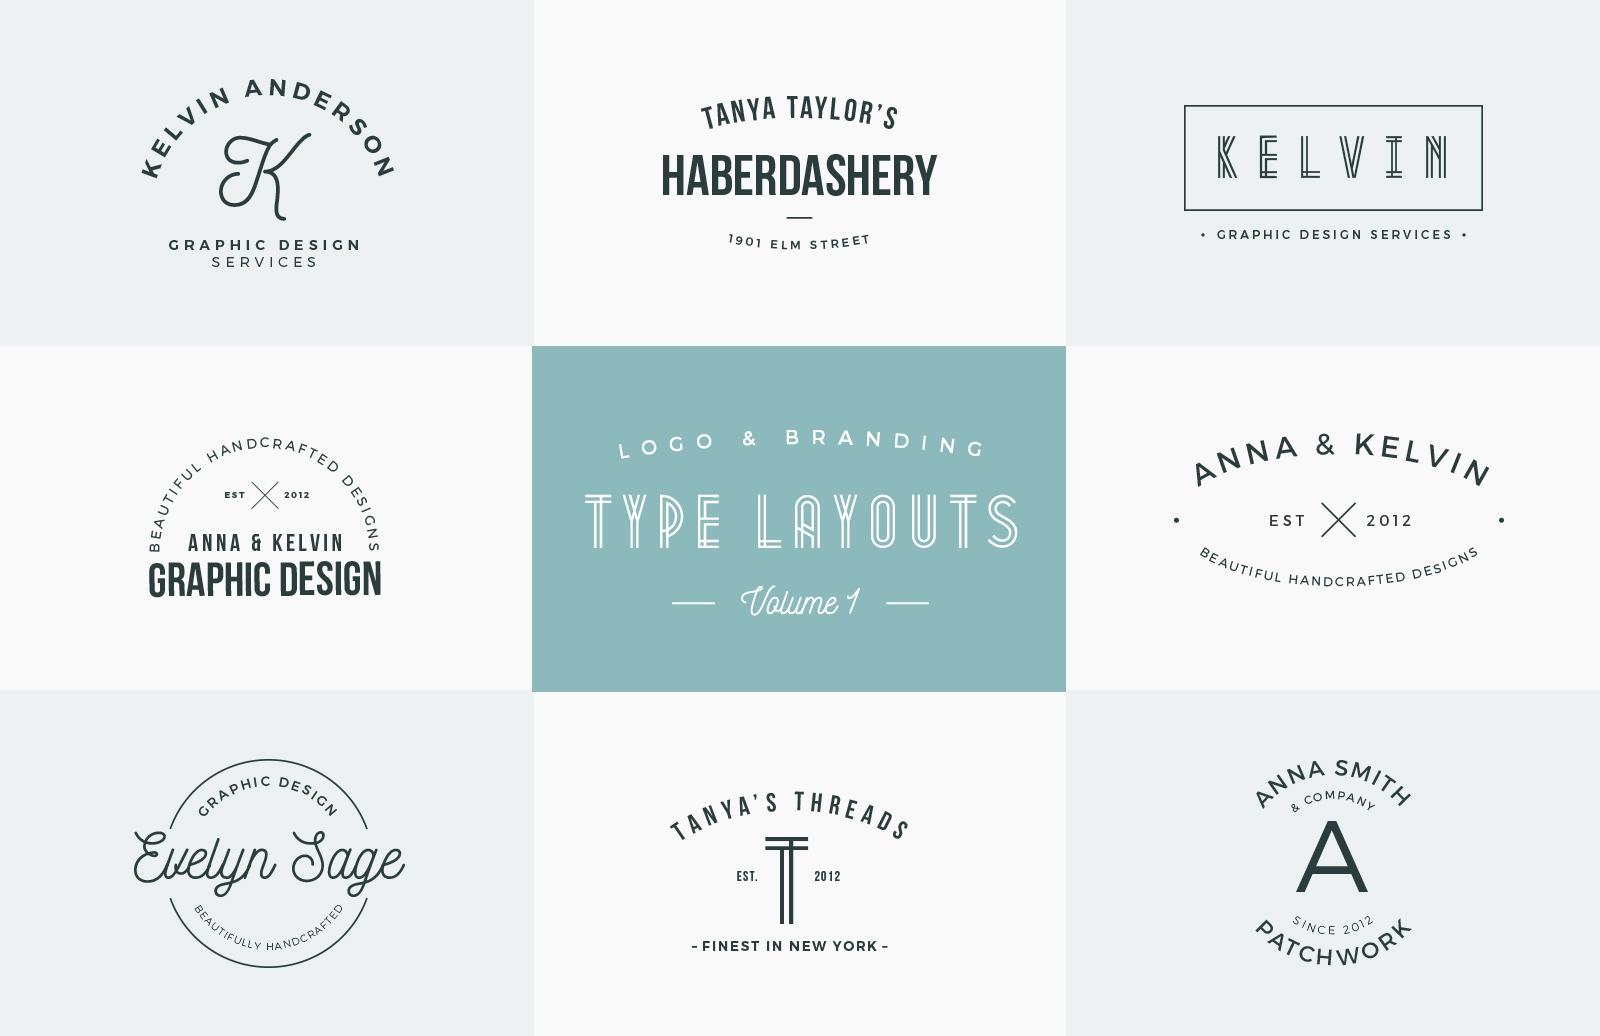 Logo & Branding Type Layouts - Vol 1